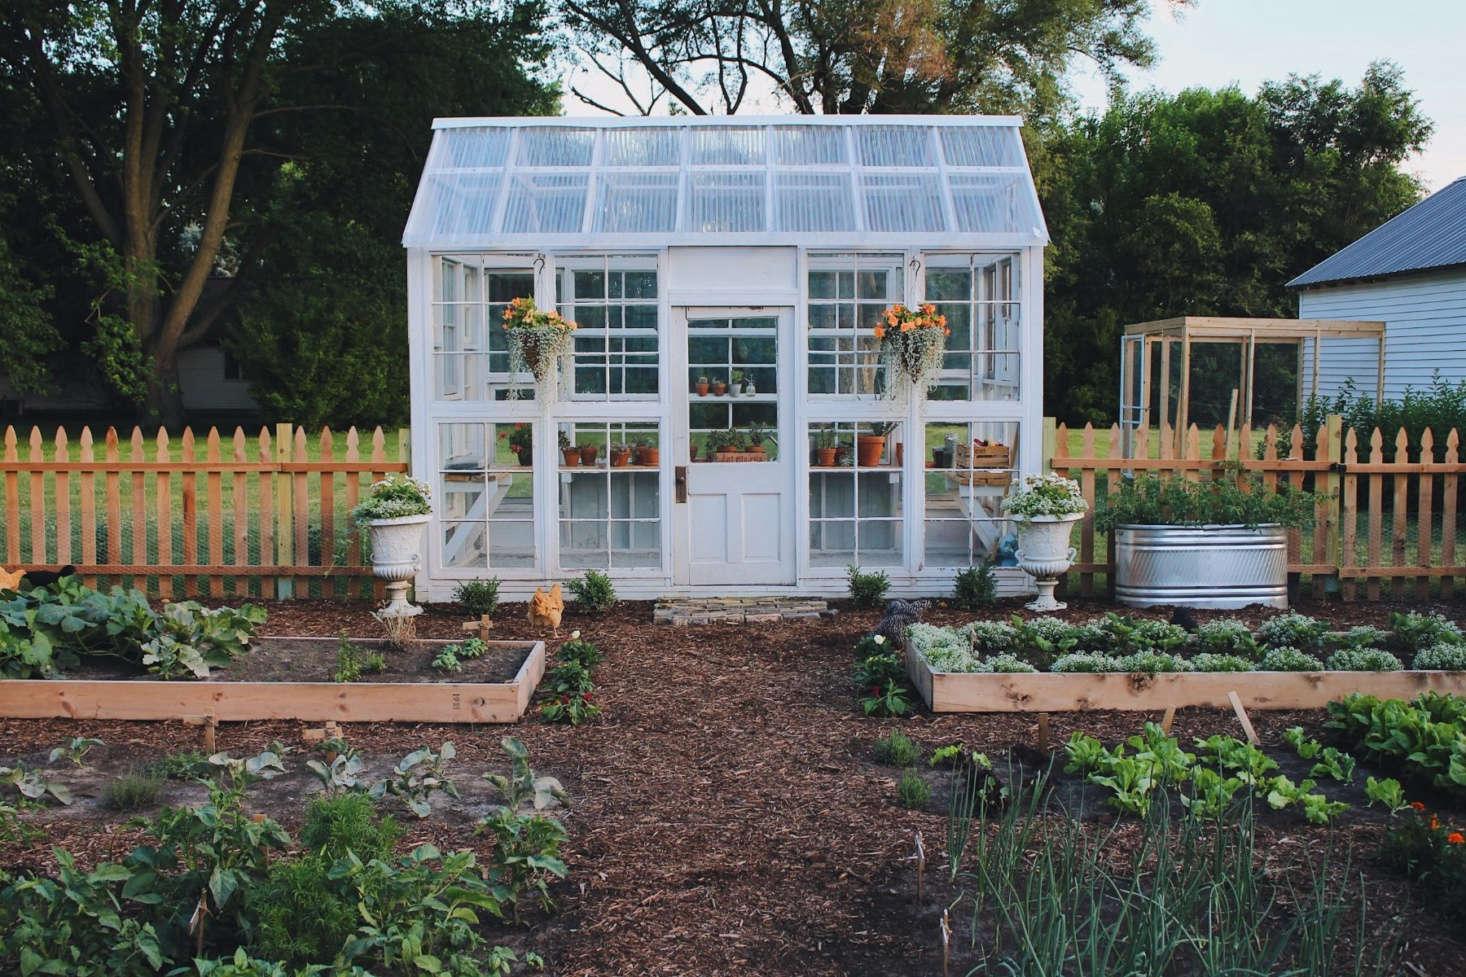 For her residential homestead in Kalona, Iowa, amateur gardenerKayla Haupt won &#8